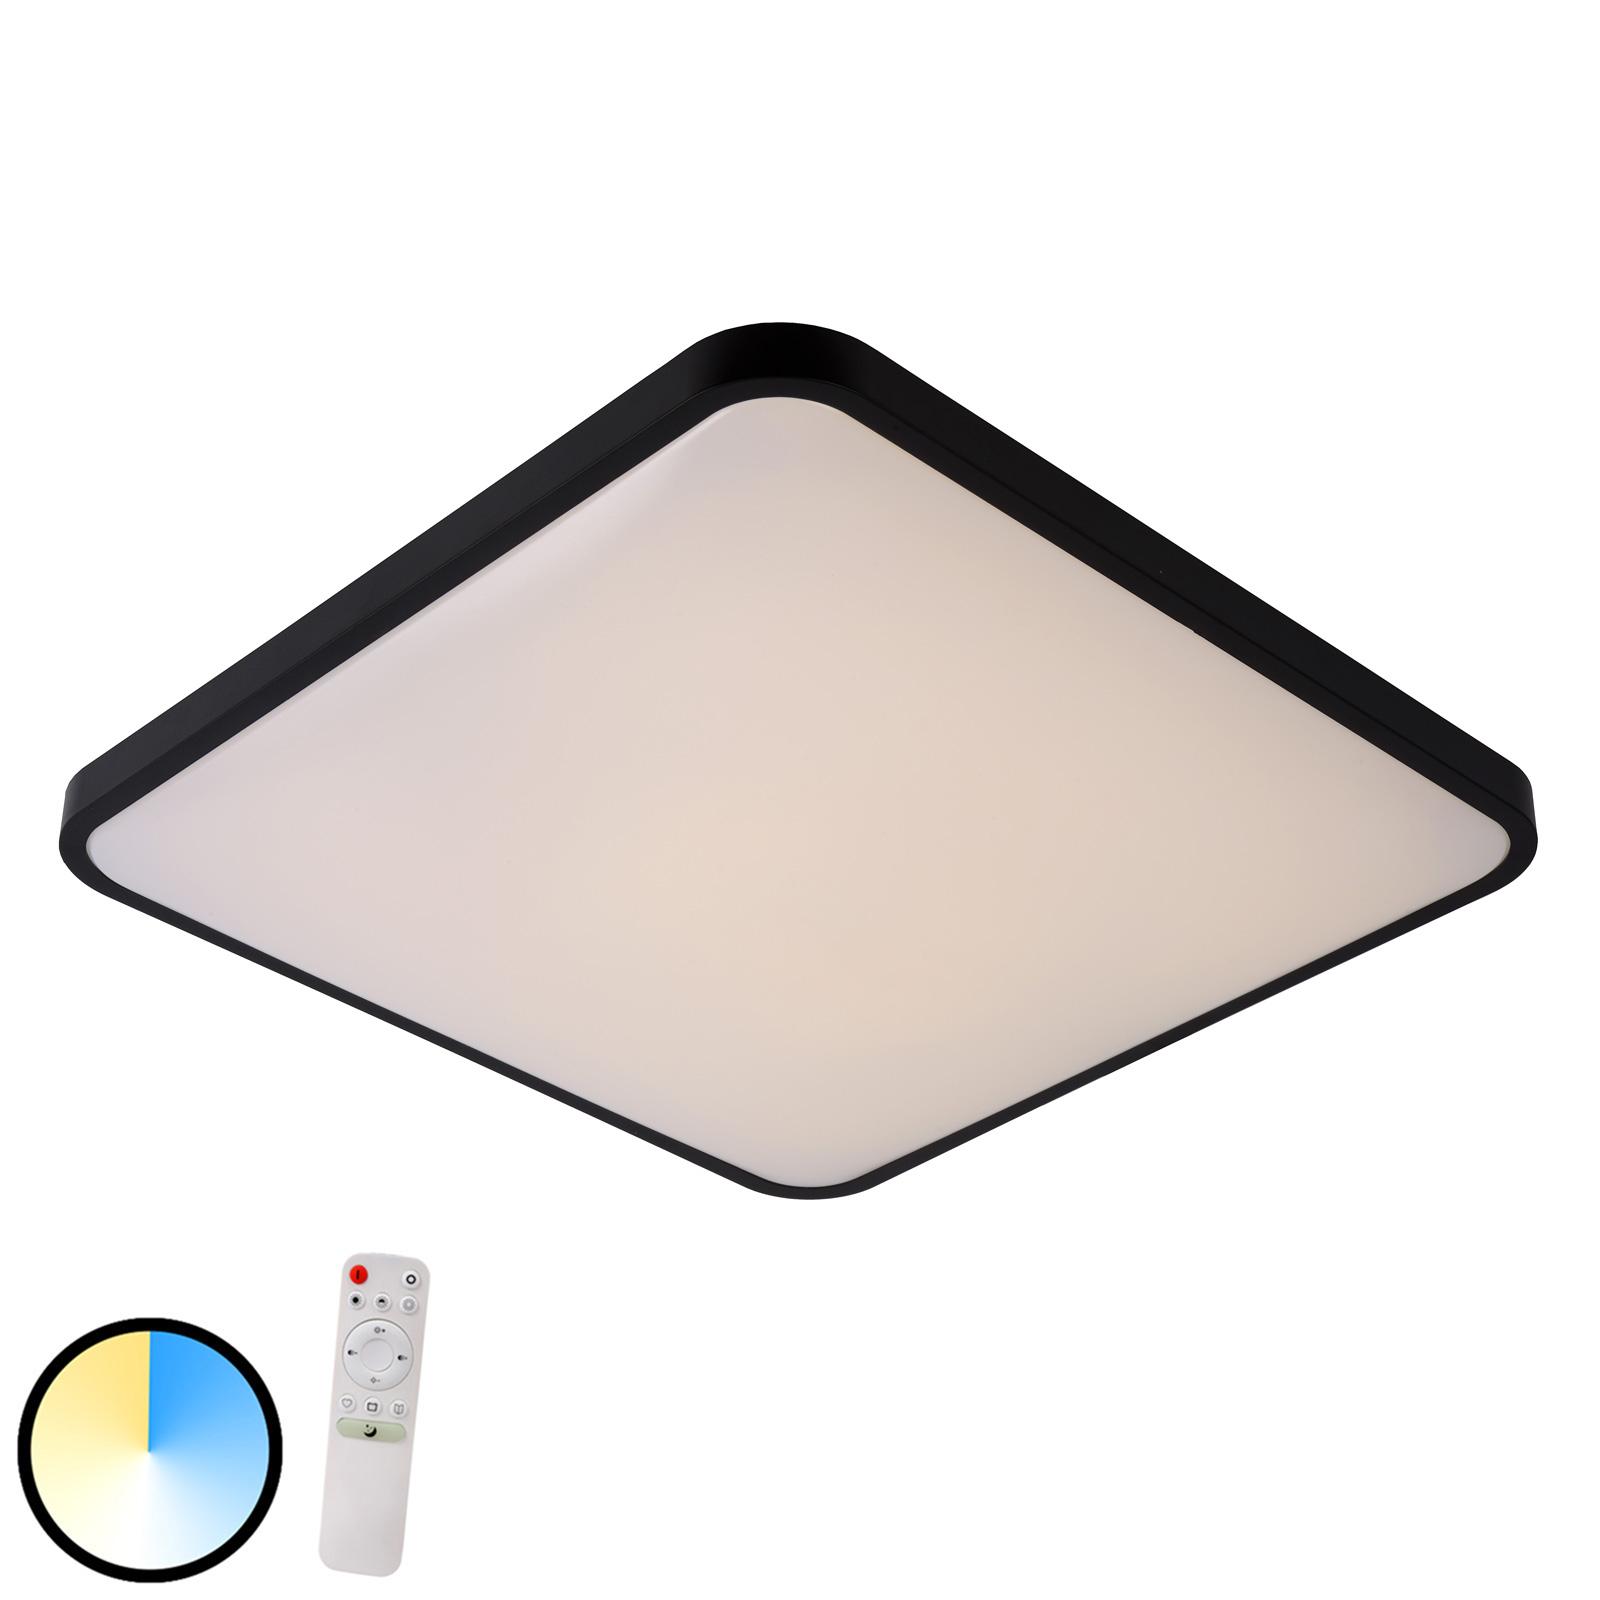 LED-kattovalaisin Polaris 54 cm x 54 cm